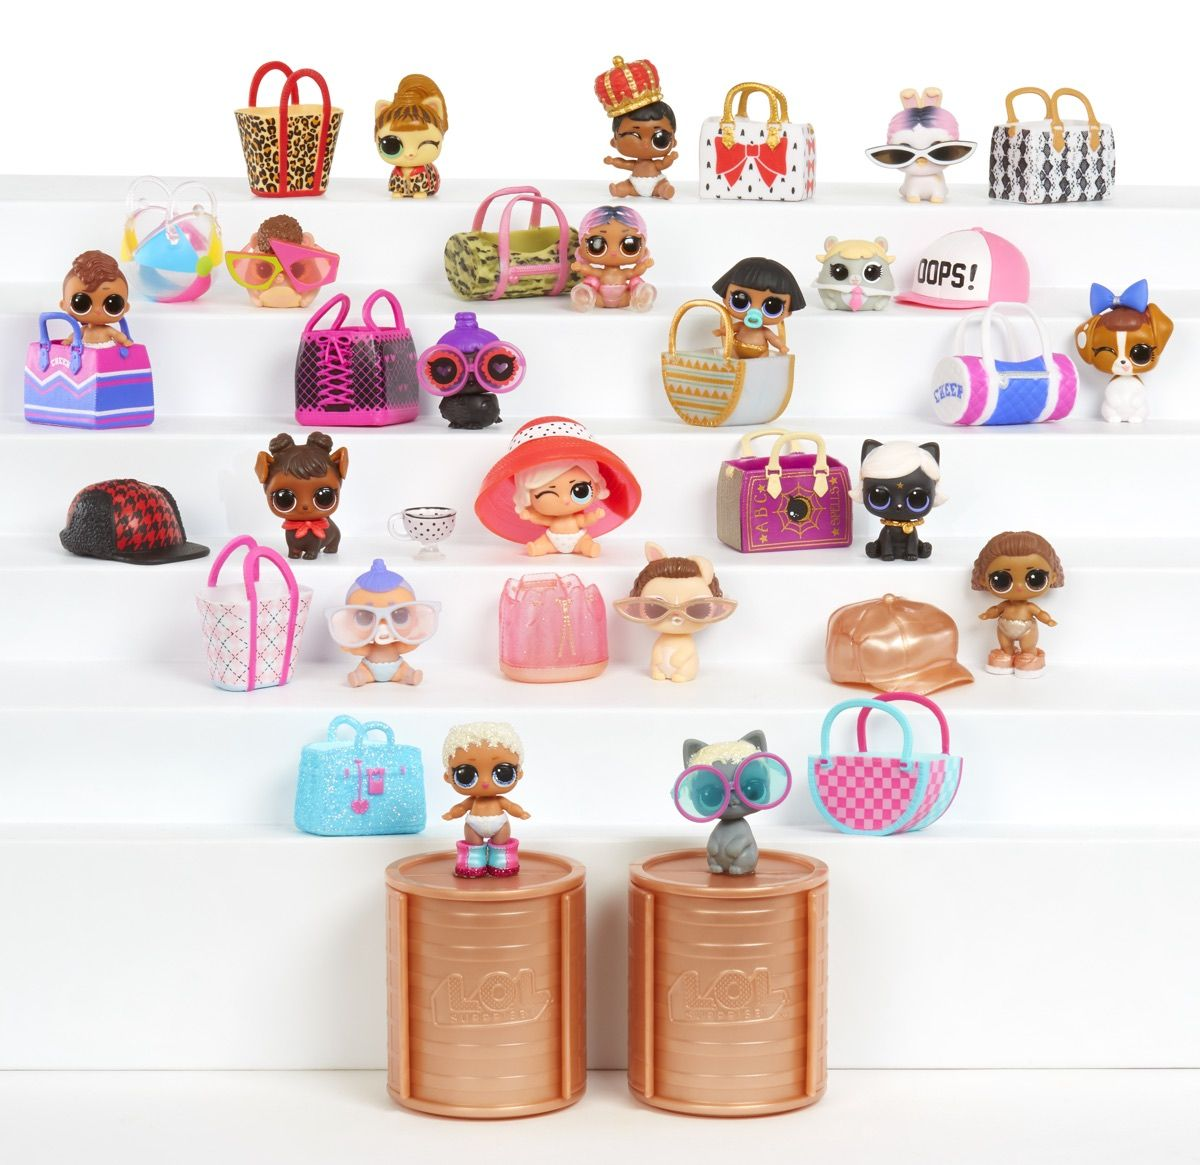 L O L Surprise Lils Makeover Series Lol Dolls Xmas Toys Lol